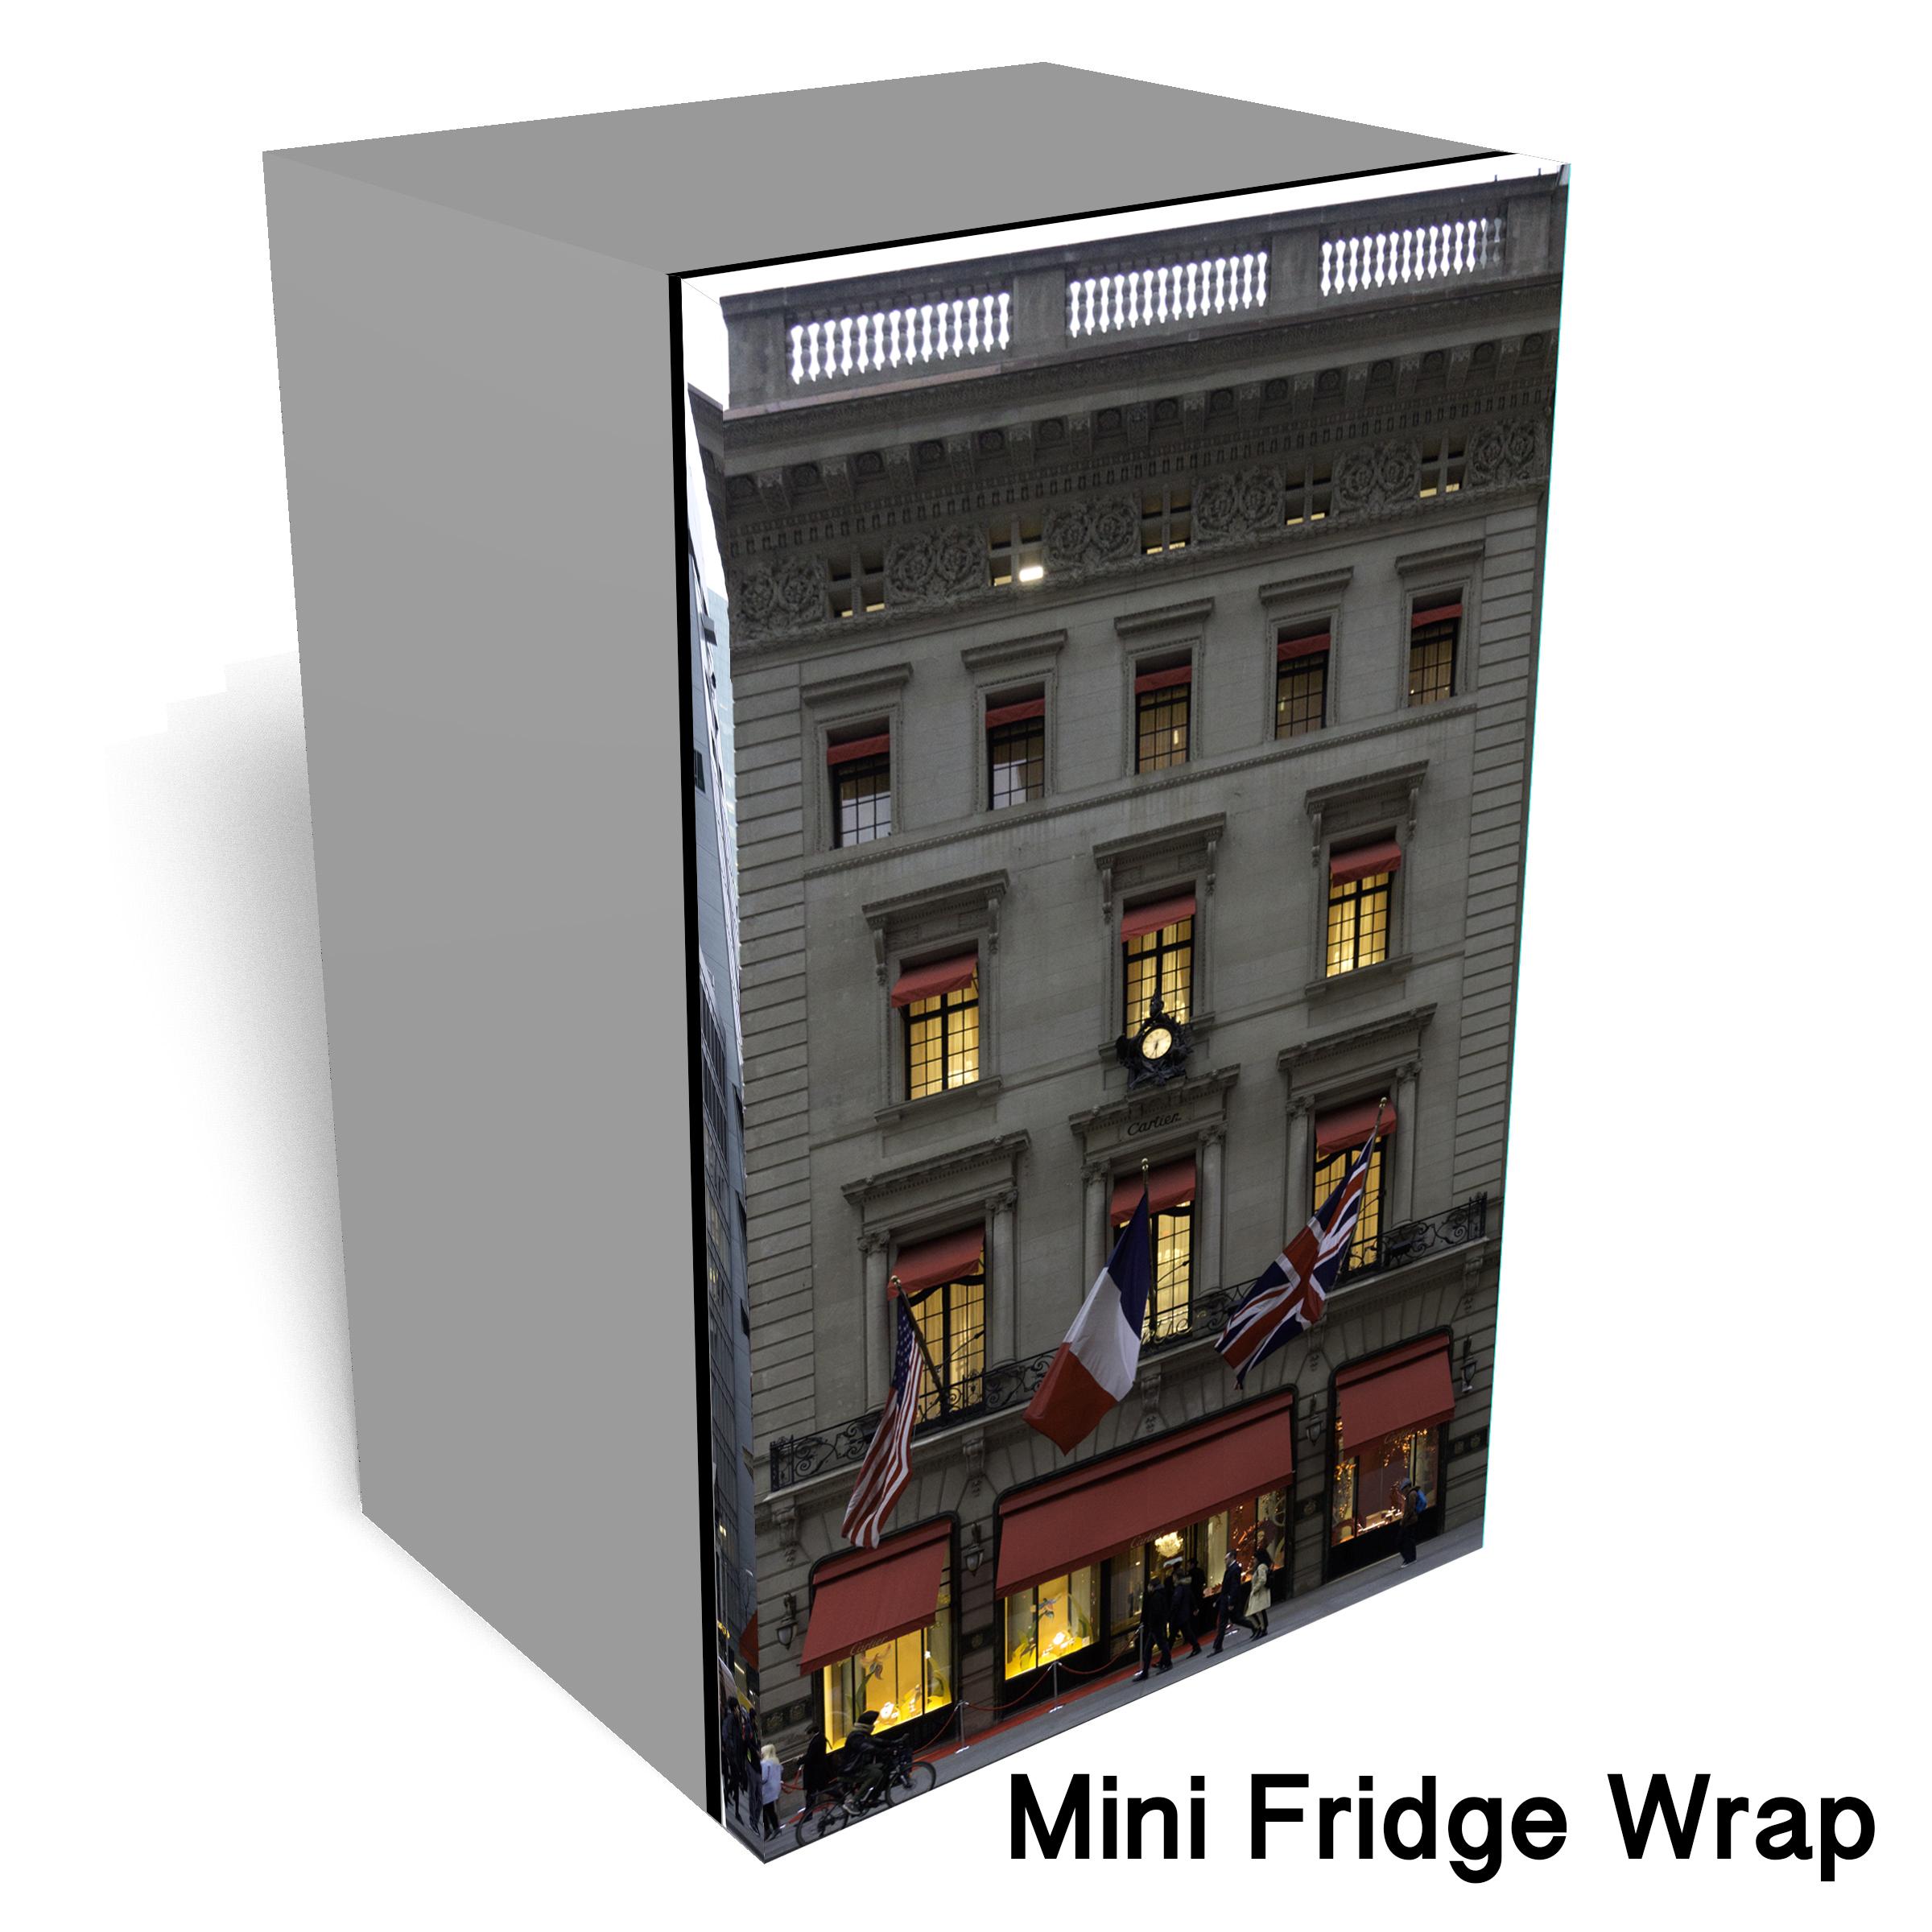 Cartier Building Mini Fridge Wrap